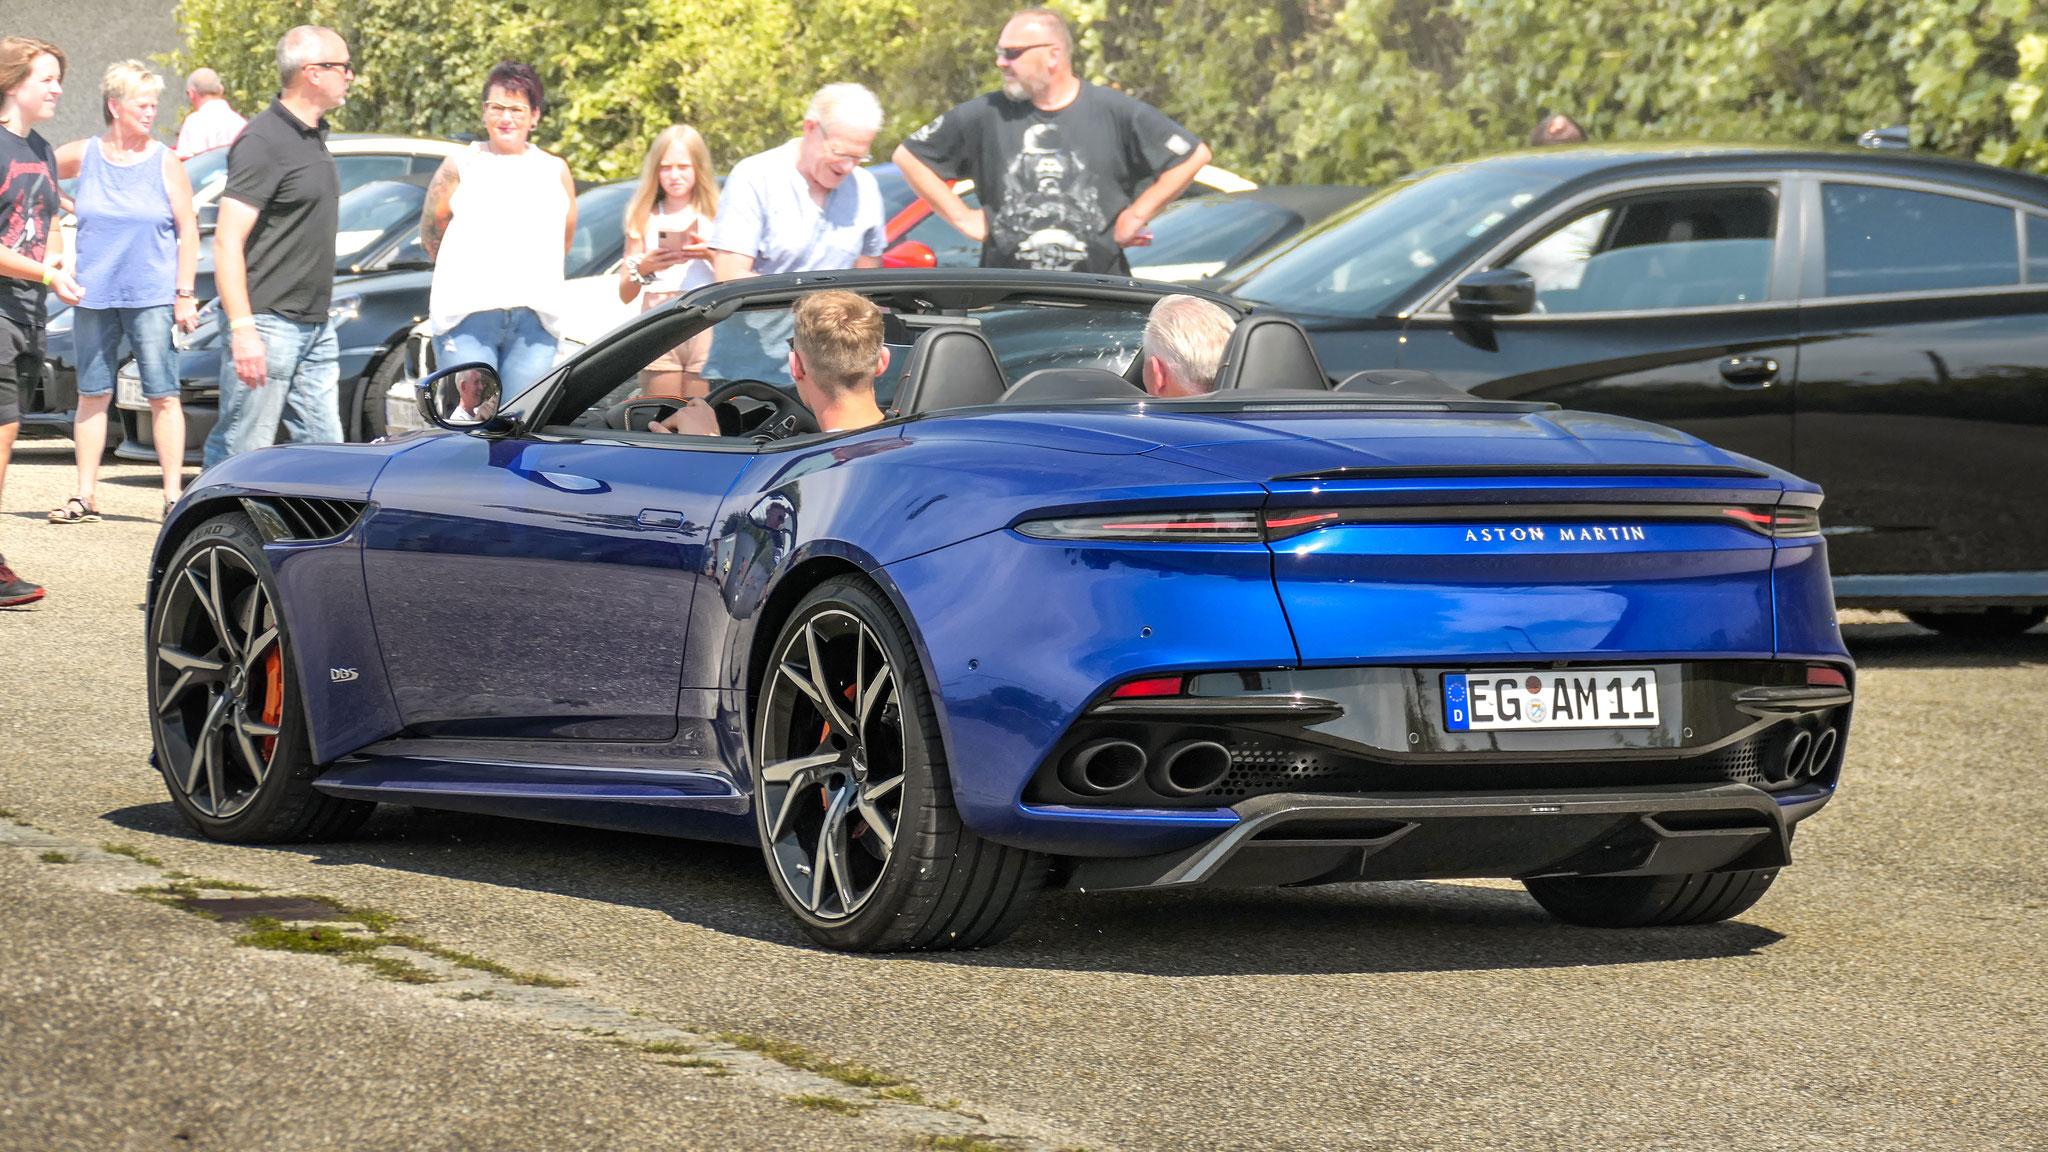 Aston Martin DBS Superleggera Volante - EG-AM-11